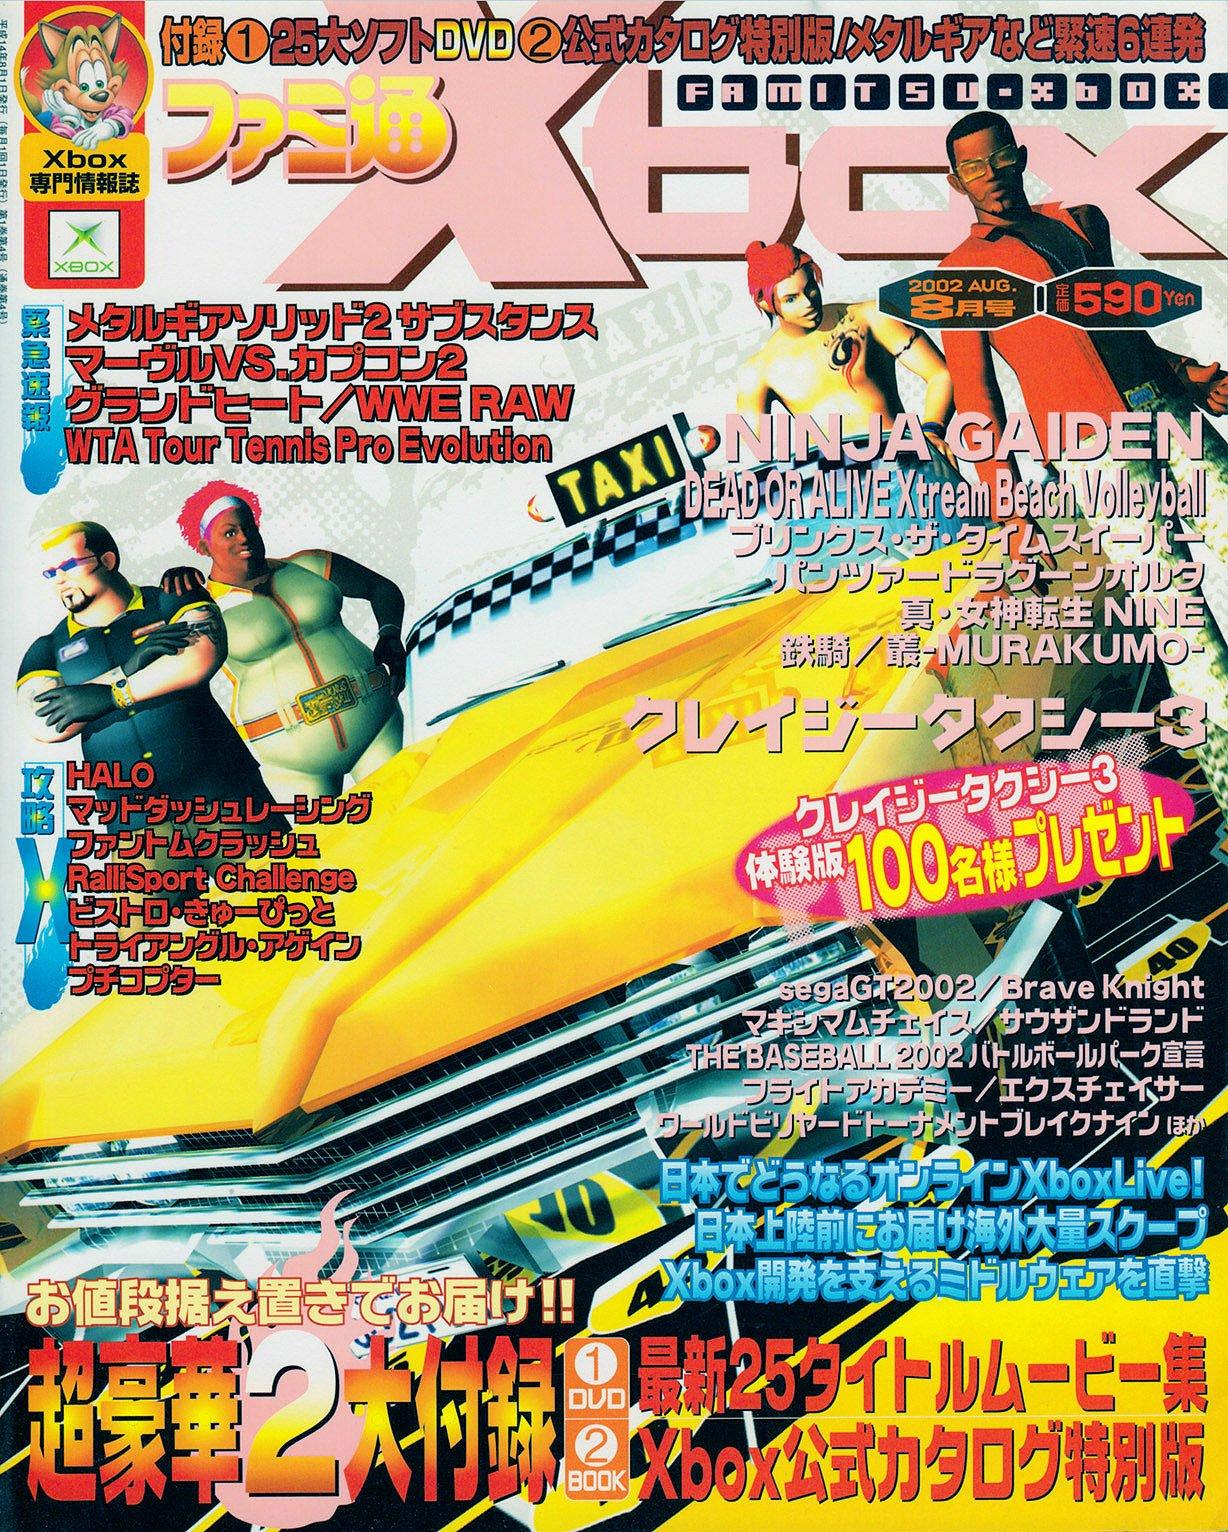 Famitsu Xbox Issue 006 (August 2002)